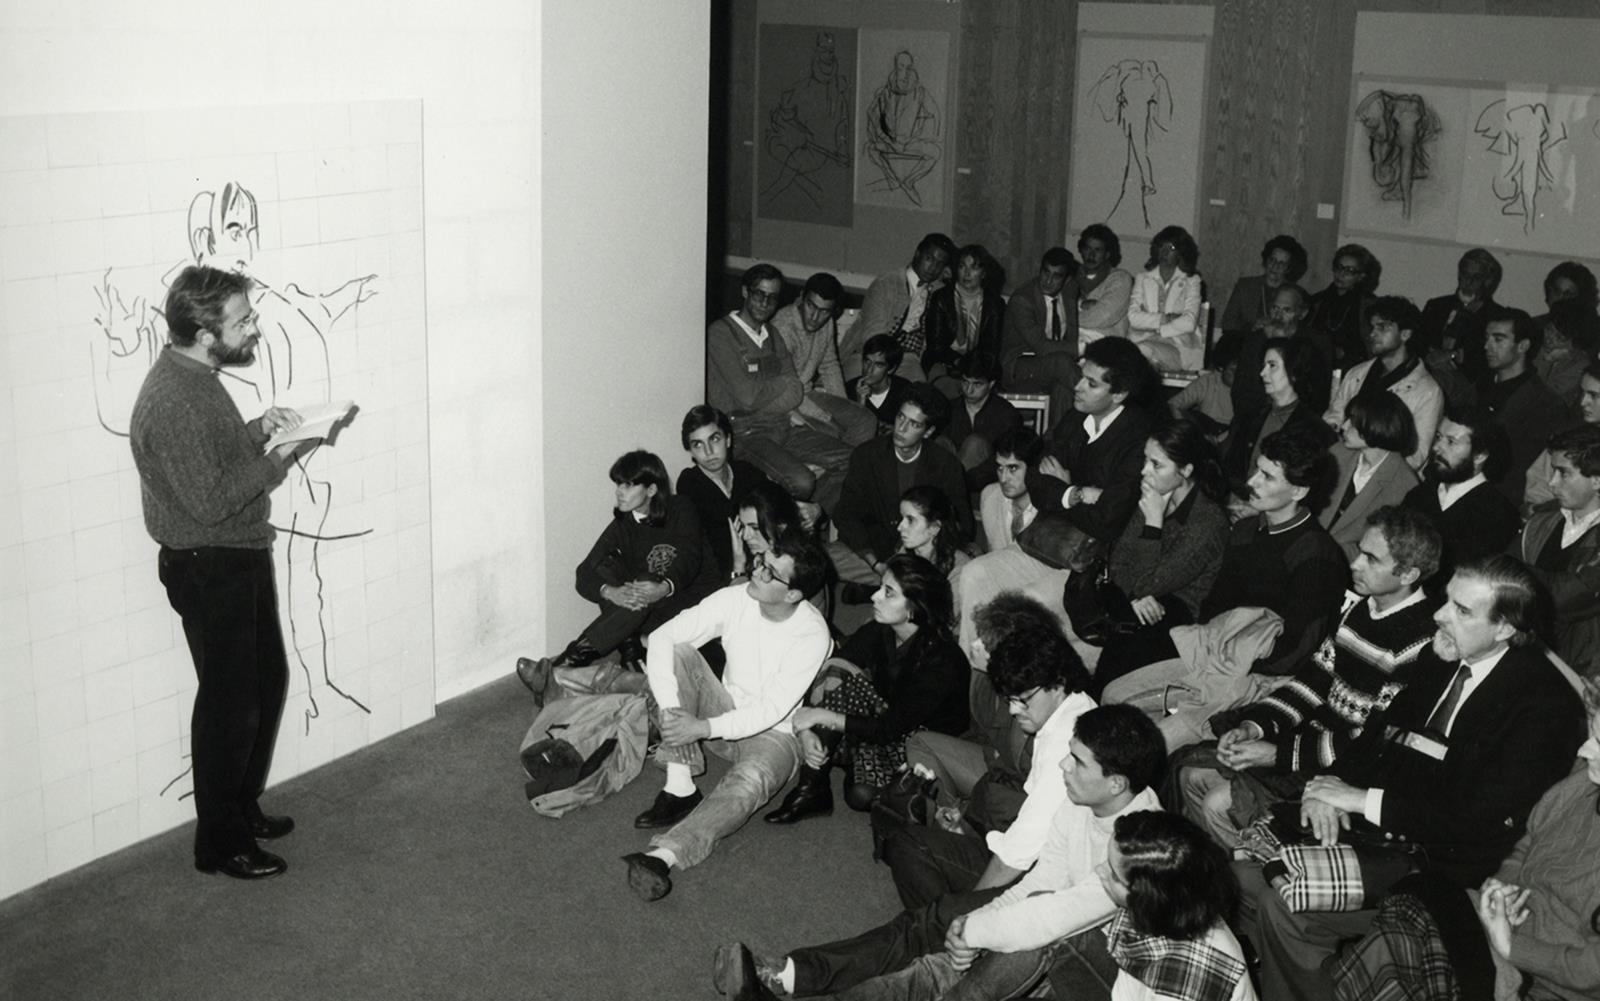 Pomar. 1 Ano de Desenho. 4 Poetas no Metropolitano de Lisboa